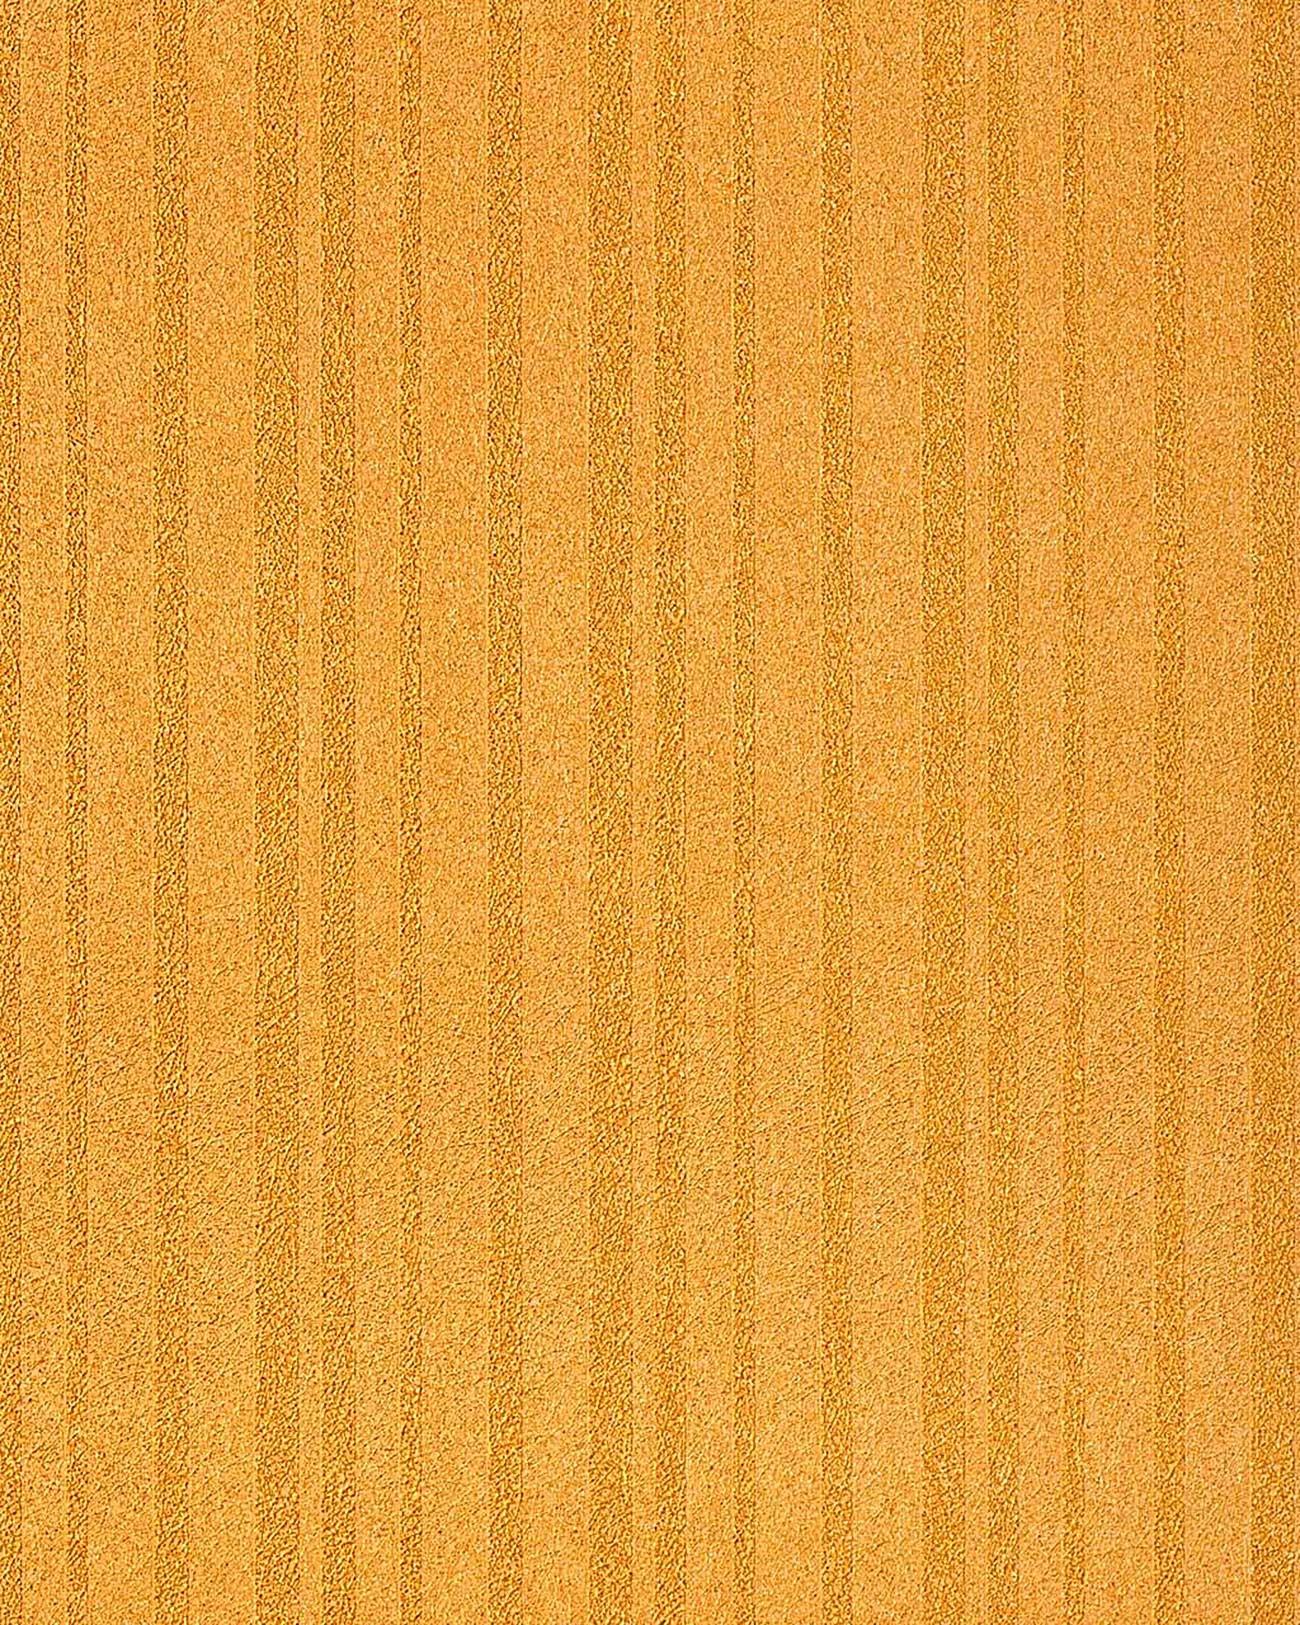 texture striped vinyl extra washable wallpaper wall. Black Bedroom Furniture Sets. Home Design Ideas